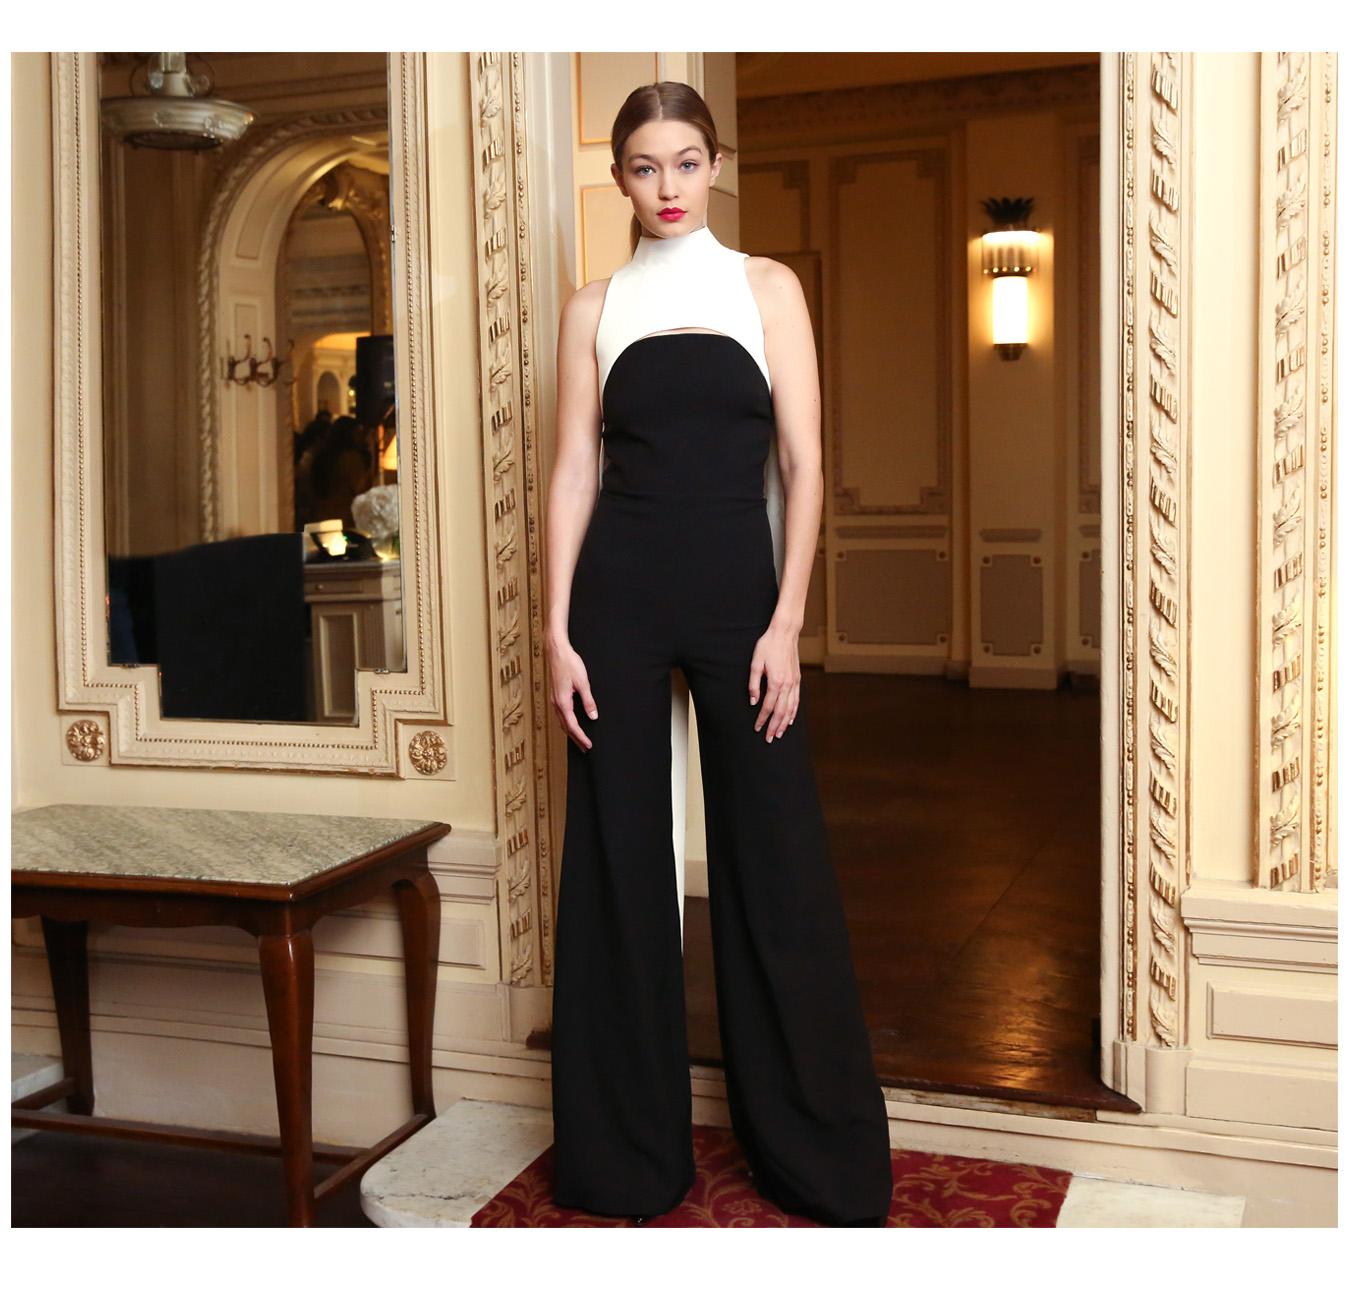 KellyTaub_Vogue_09.jpg